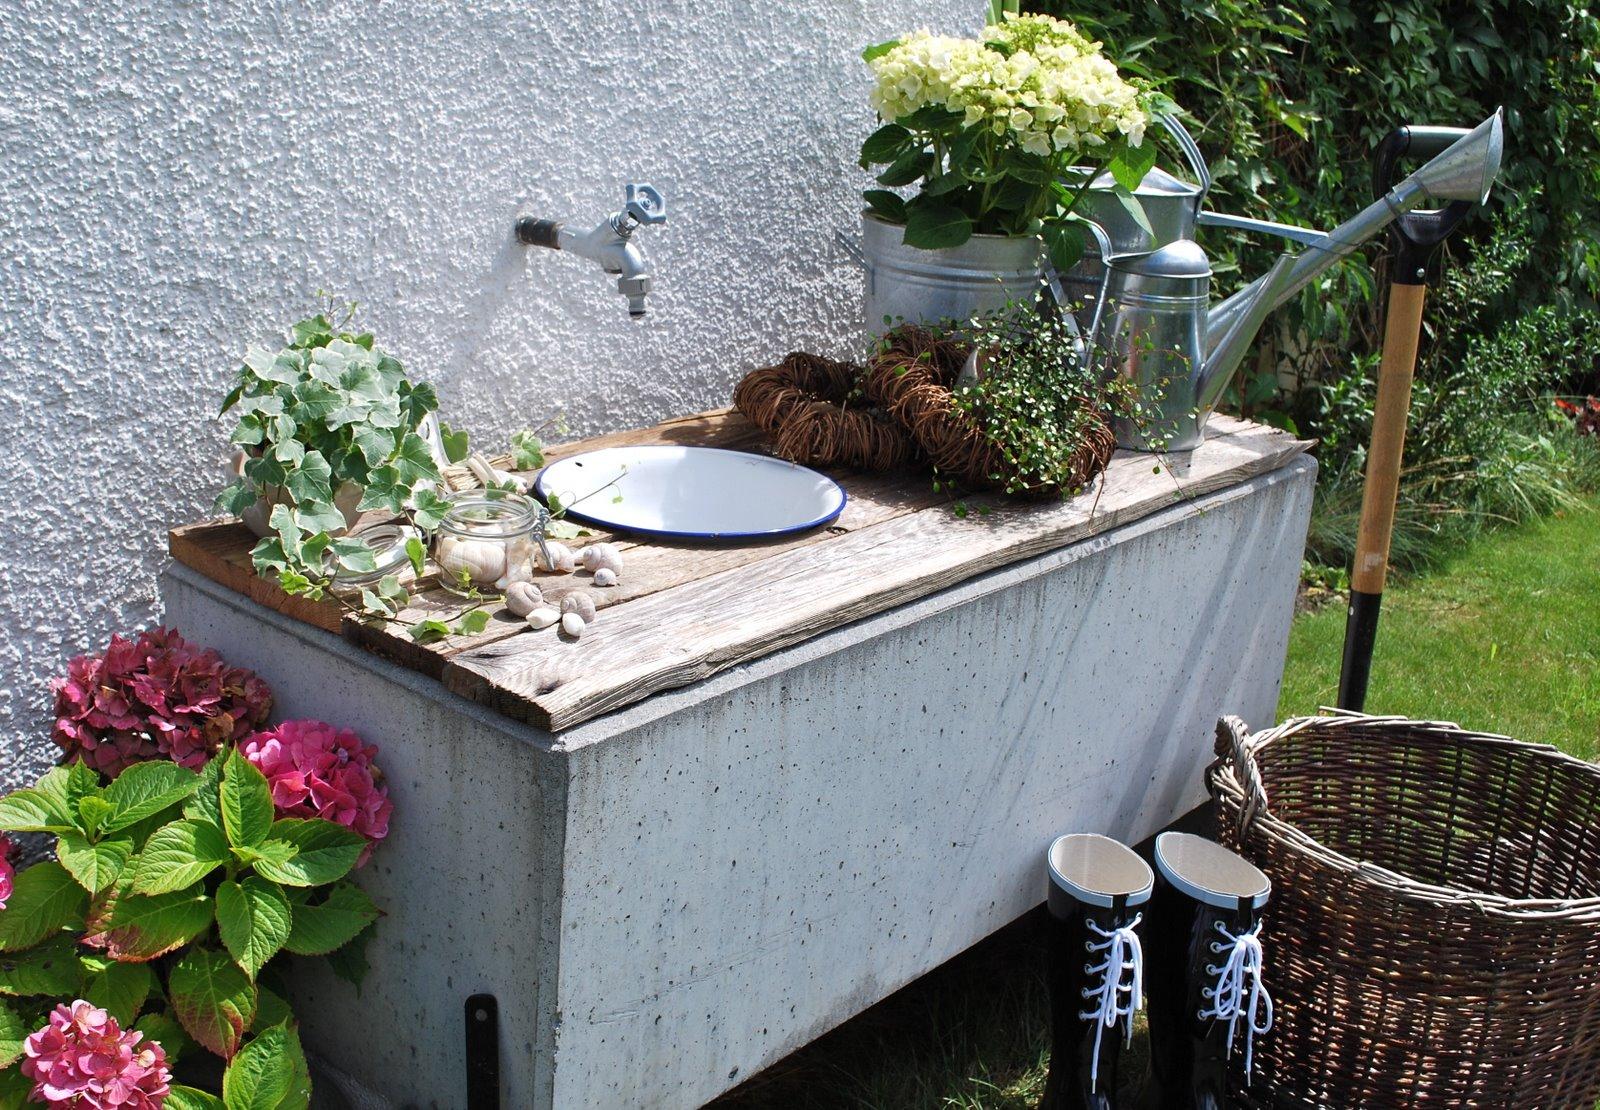 Mamas kram waschplatz im garten - Garten waschtisch ...